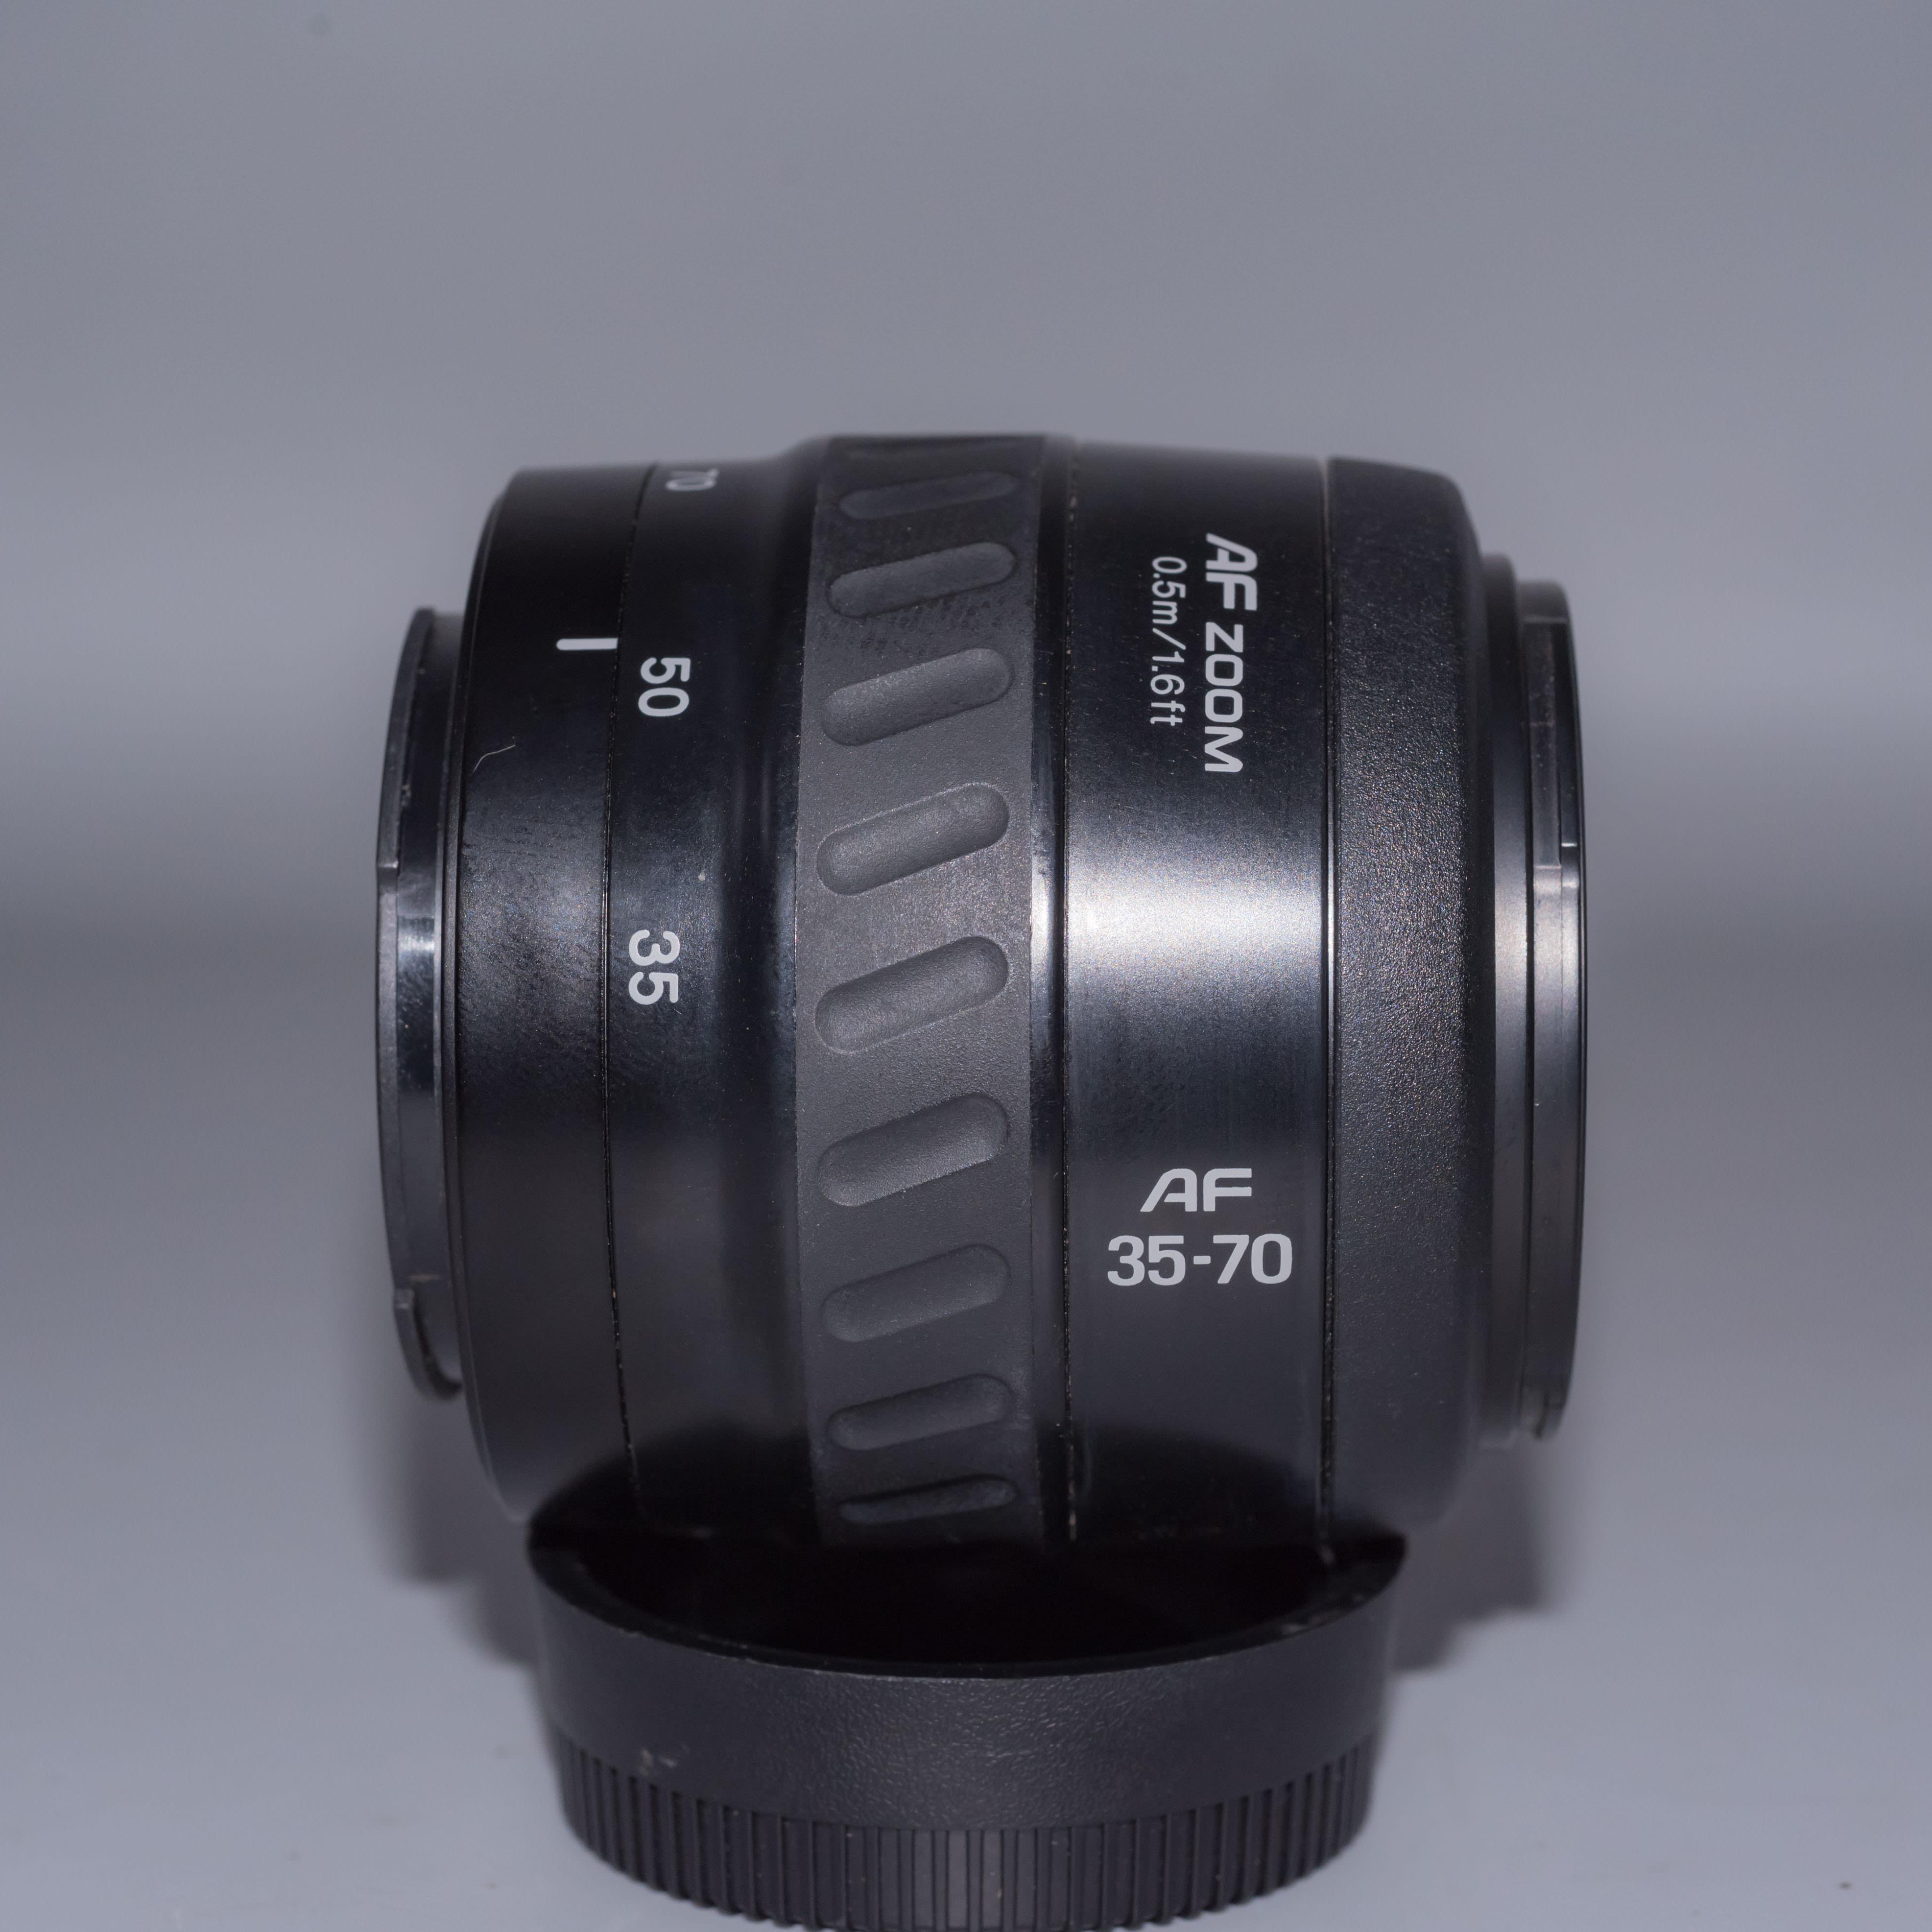 minolta-35-70mm-f3-5-4-5-af-sony-a-35-70-3-5-4-5-12682